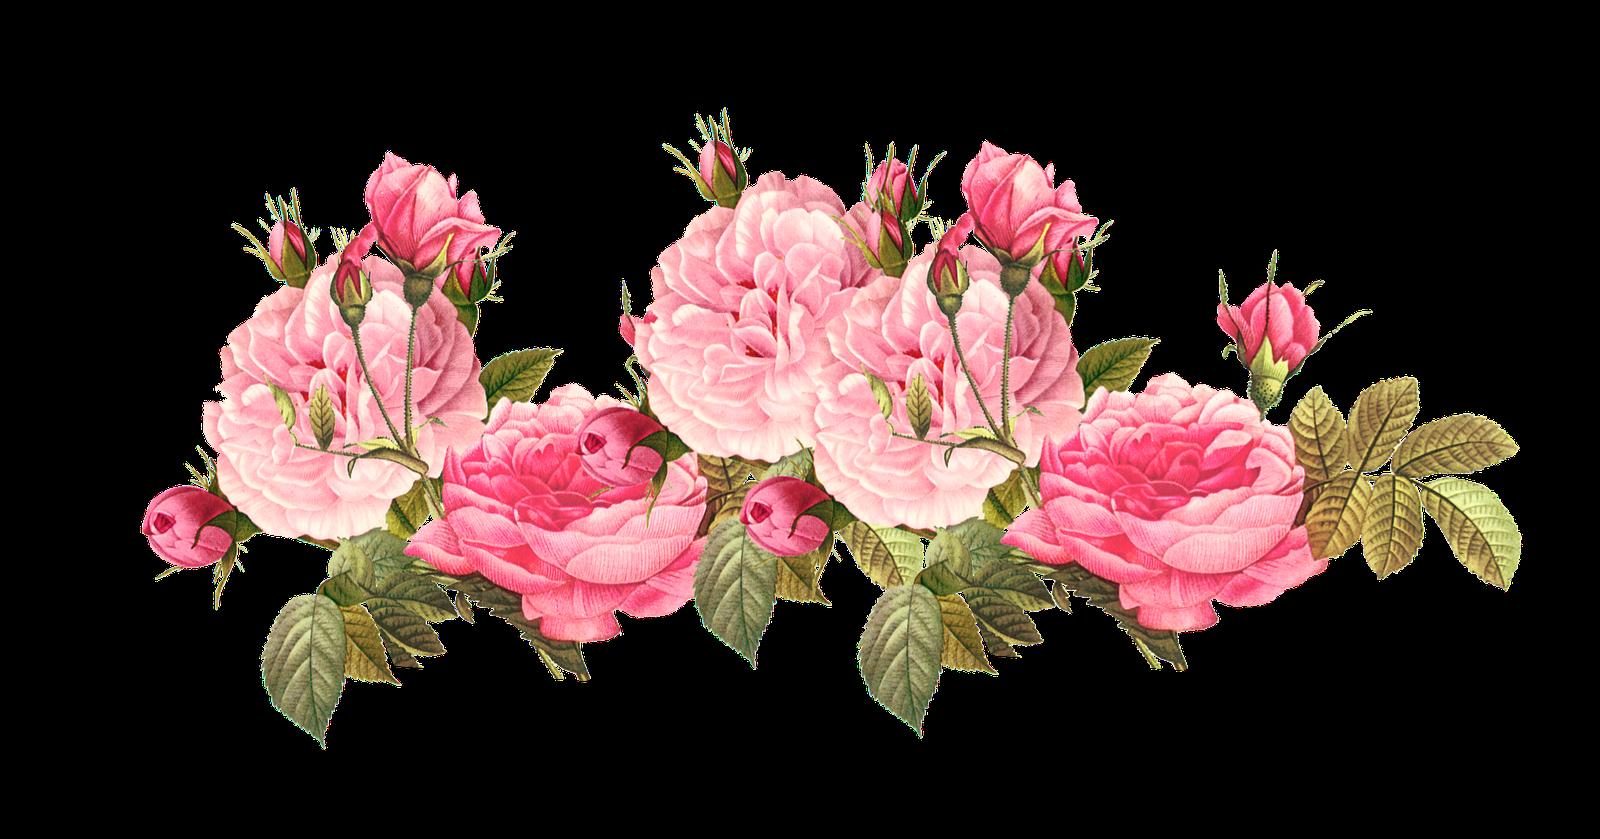 Vintage Pink Roses Background Marcos dora la exploradora png 1600x839